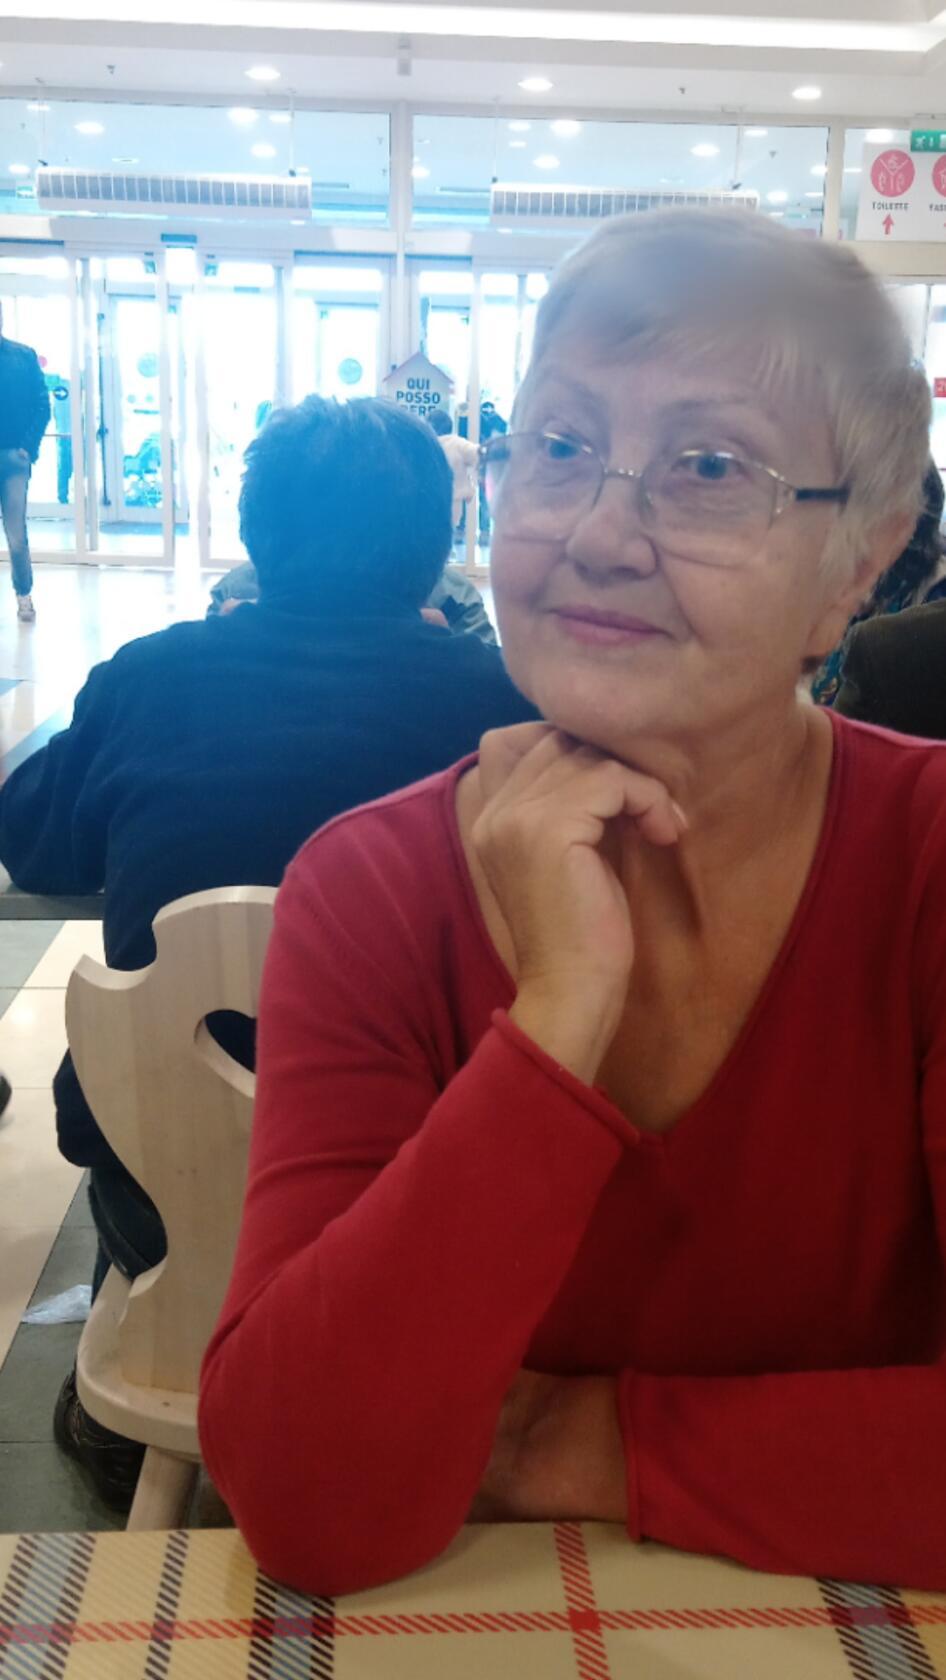 Татьяна Субботина: биография